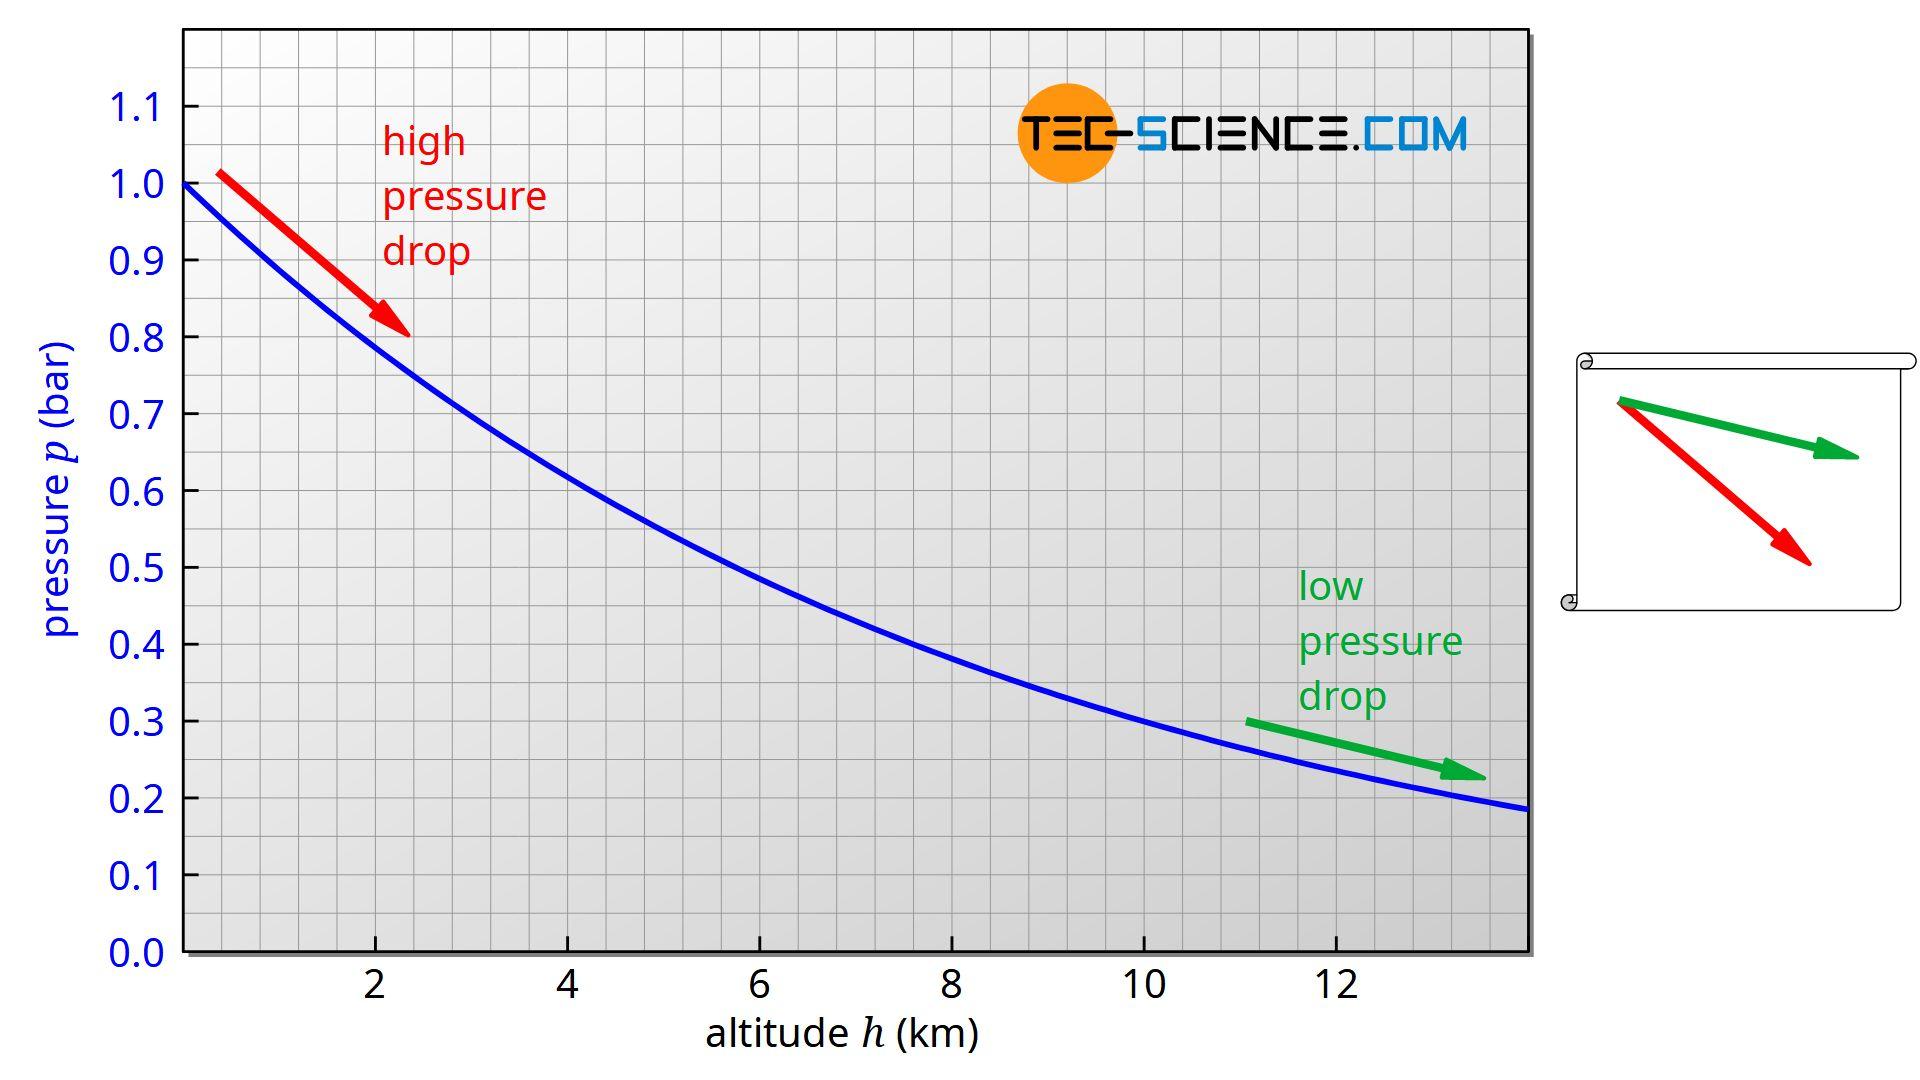 Pressure decrease (pressure gradient) at high and low altitudes